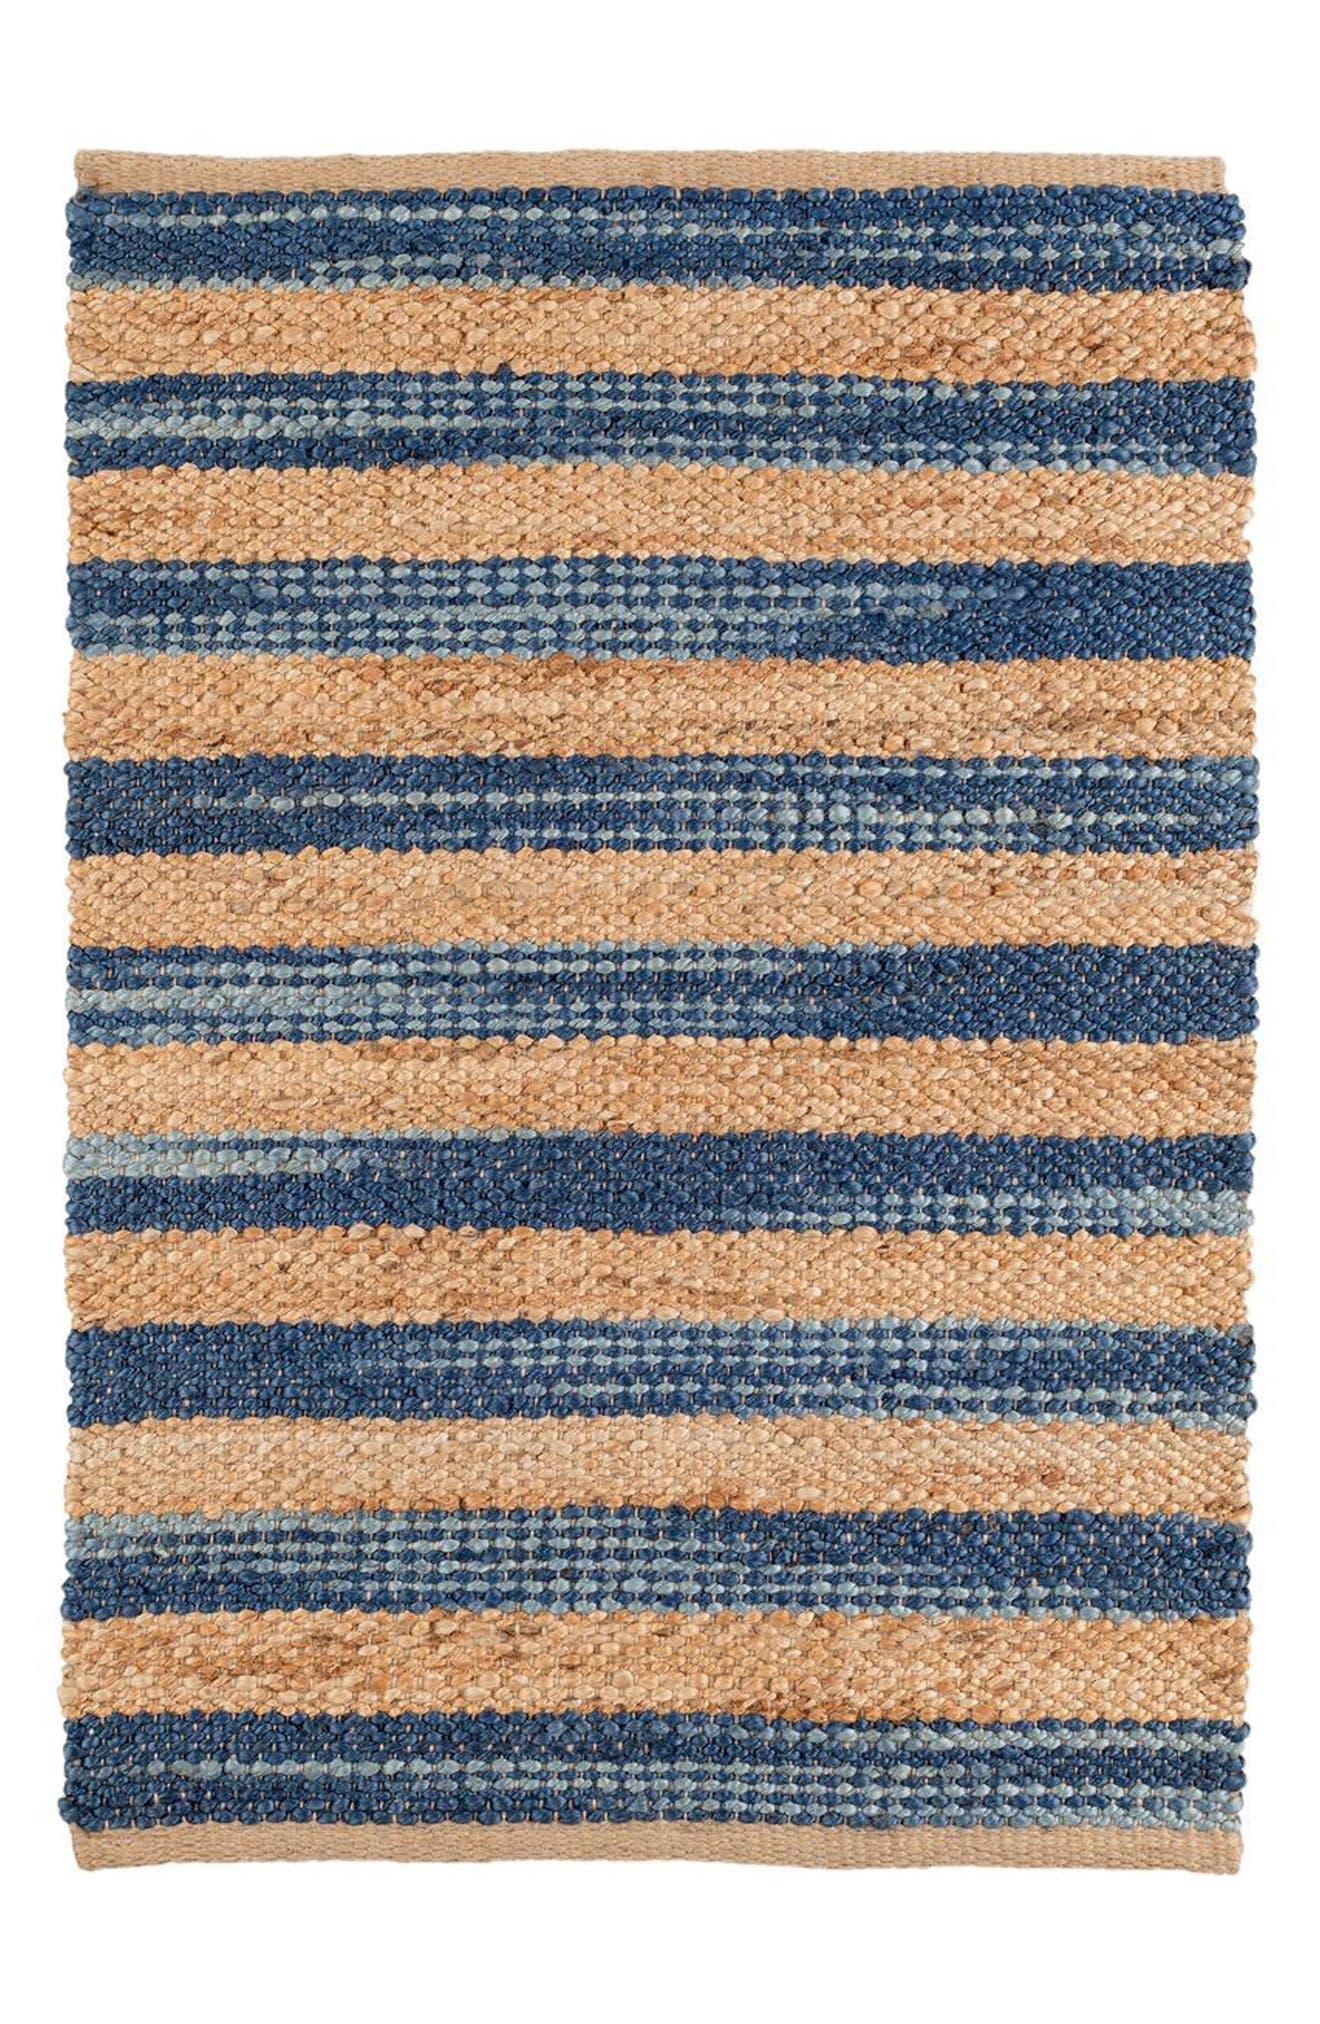 Corfu Blue Jute Rug,                         Main,                         color, 400